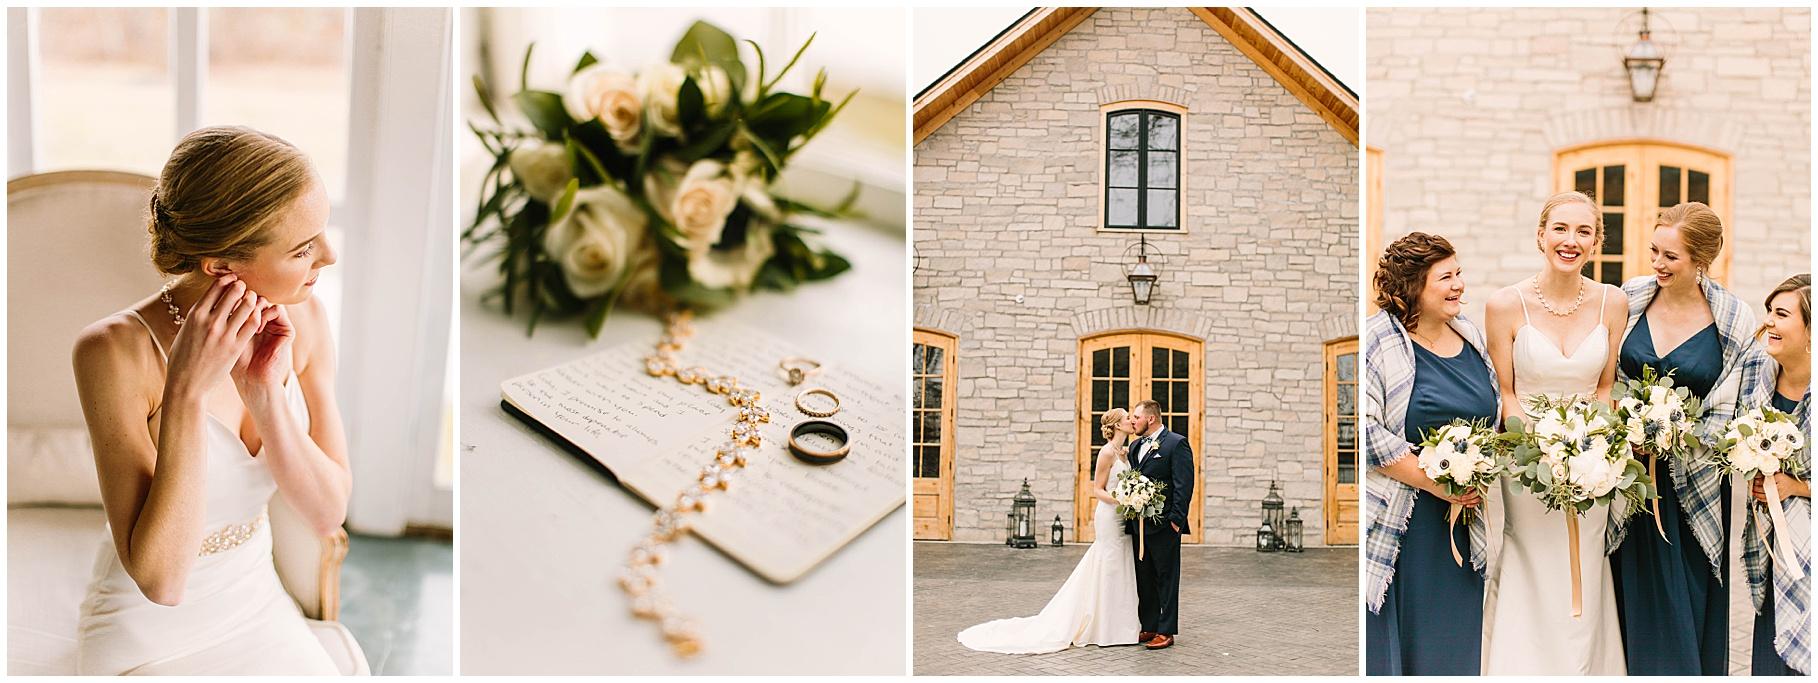 Veronica Young Photography, Winter Wedding inspo, St. Louis Wedding Photographer